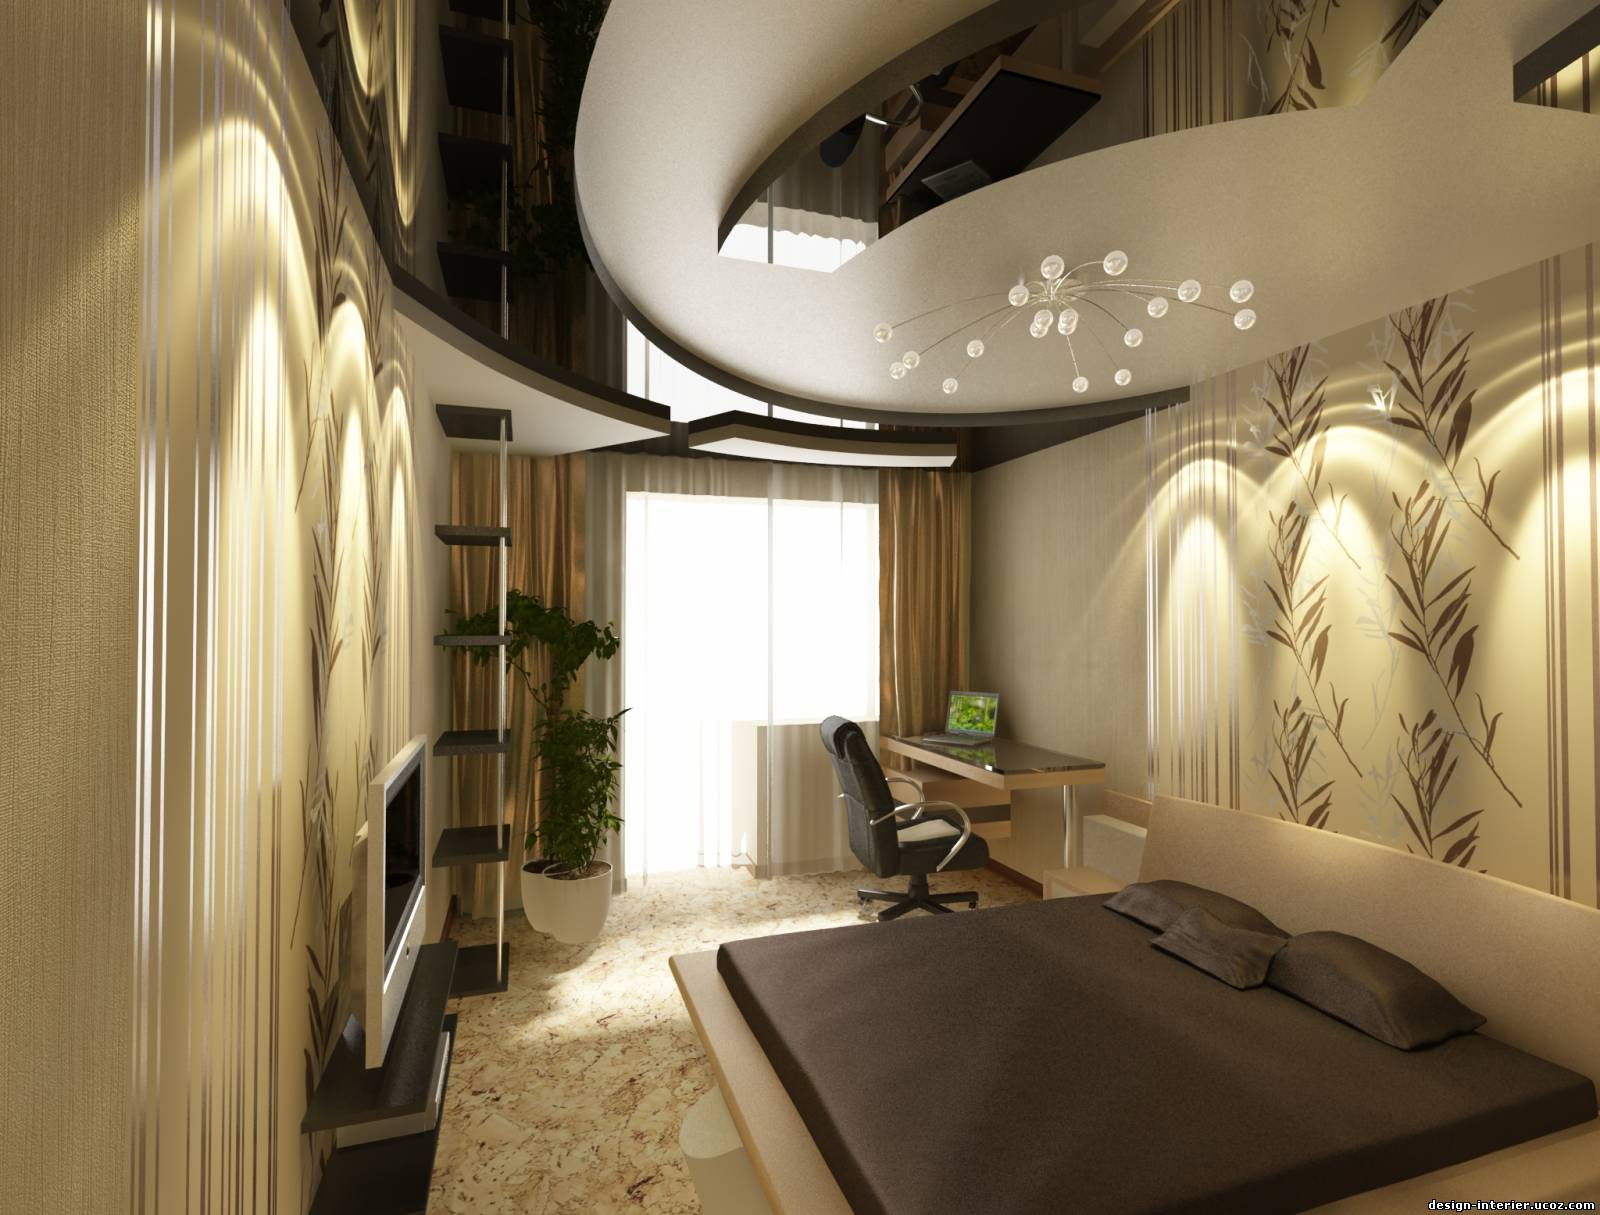 Plafond marmite polystyrene montpellier maison devis soci t mizly - Faux plafond polystyrene ...